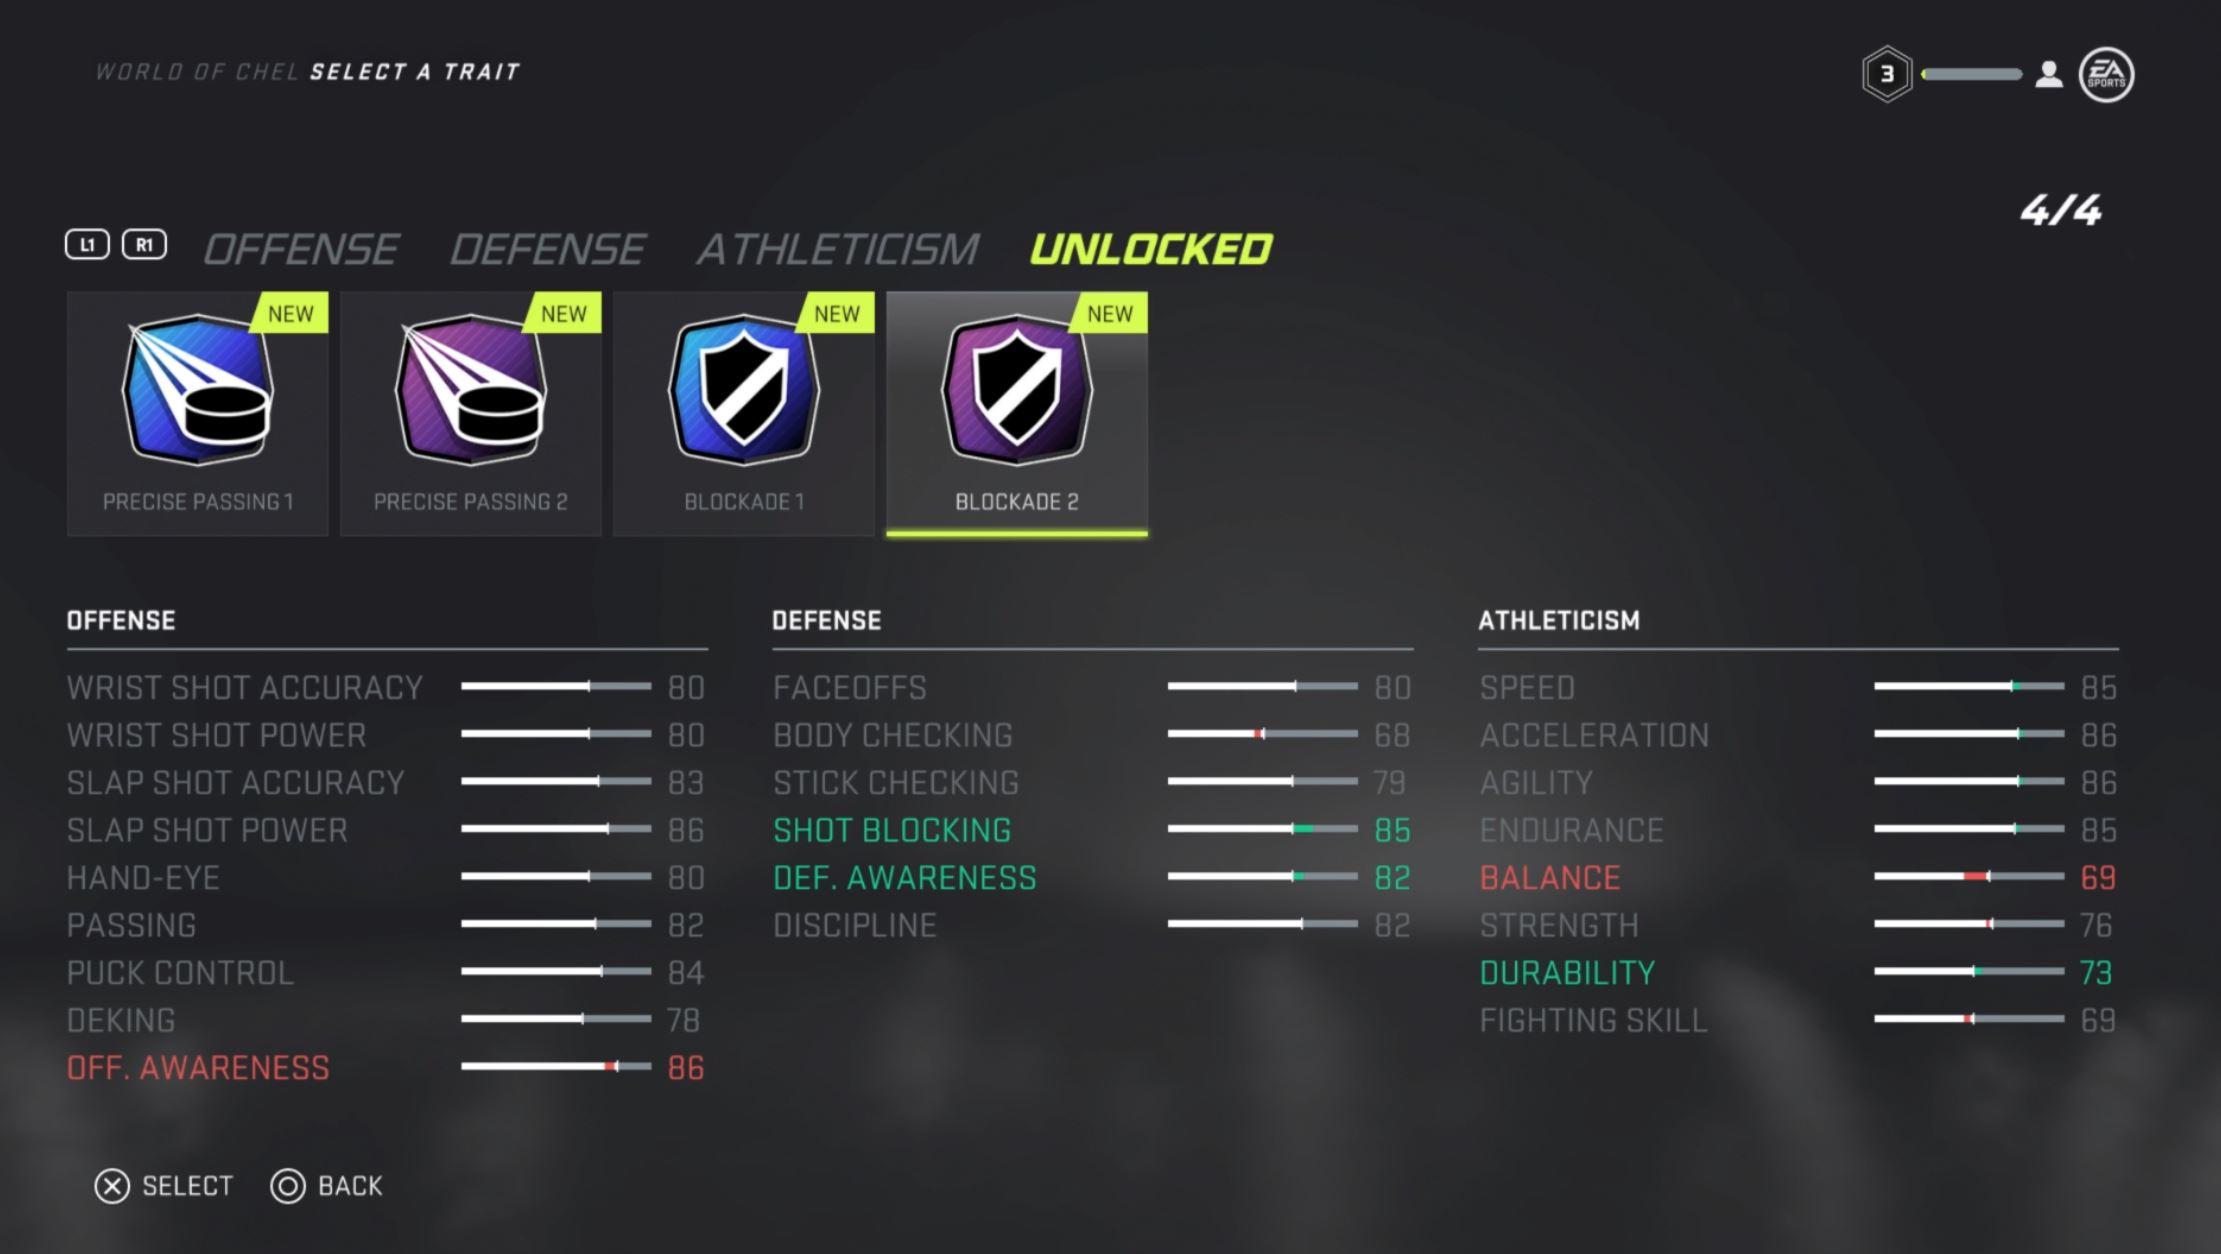 player traits